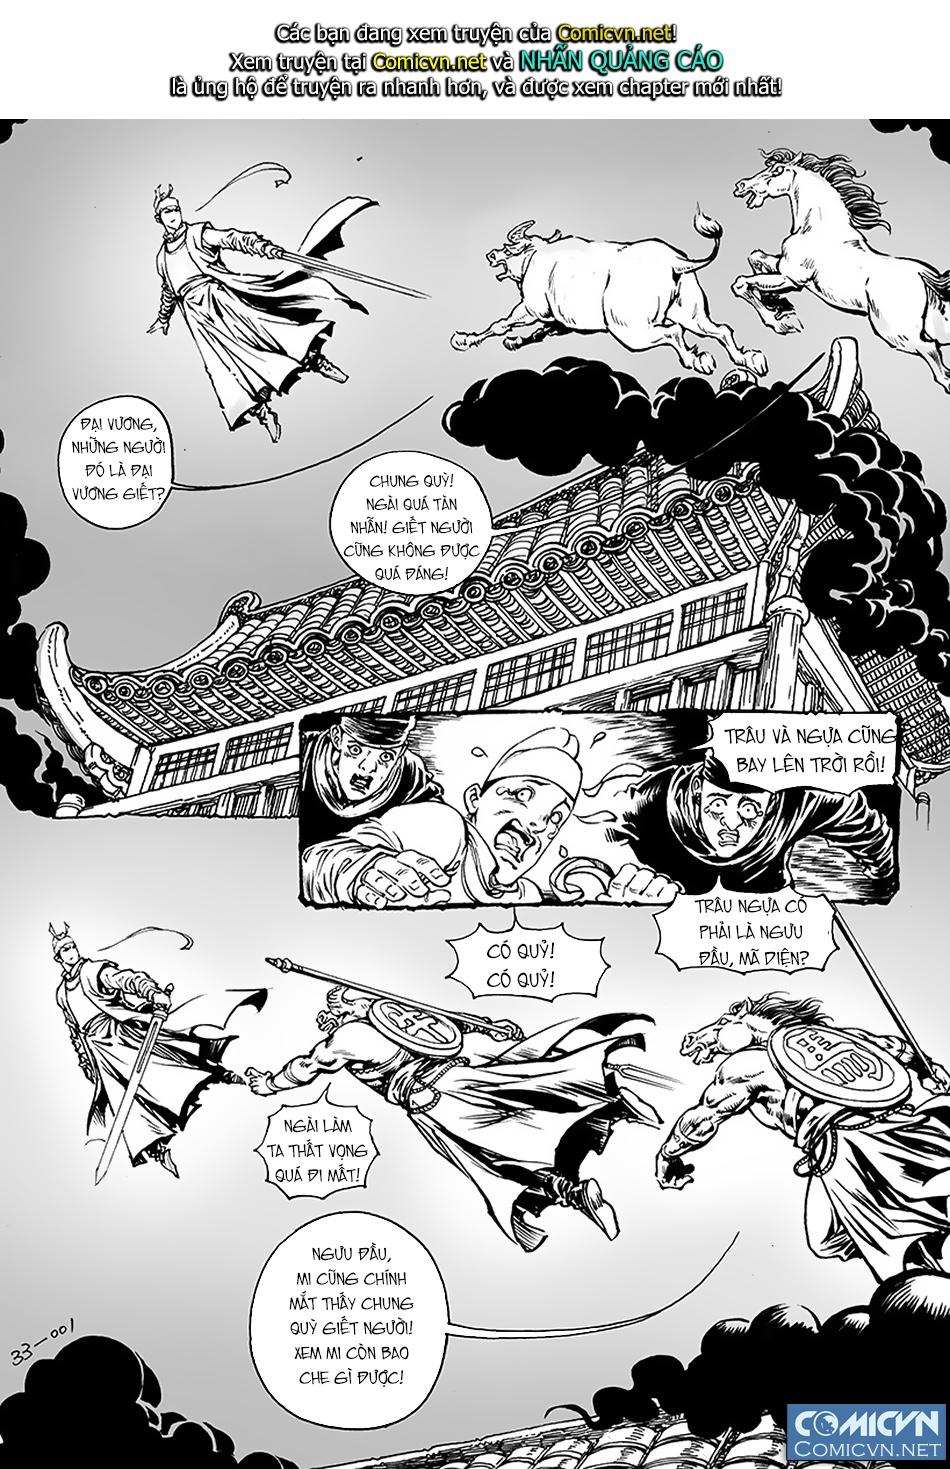 Chung Quỳ Truyền Kỳ Chapter 19 - Hamtruyen.vn